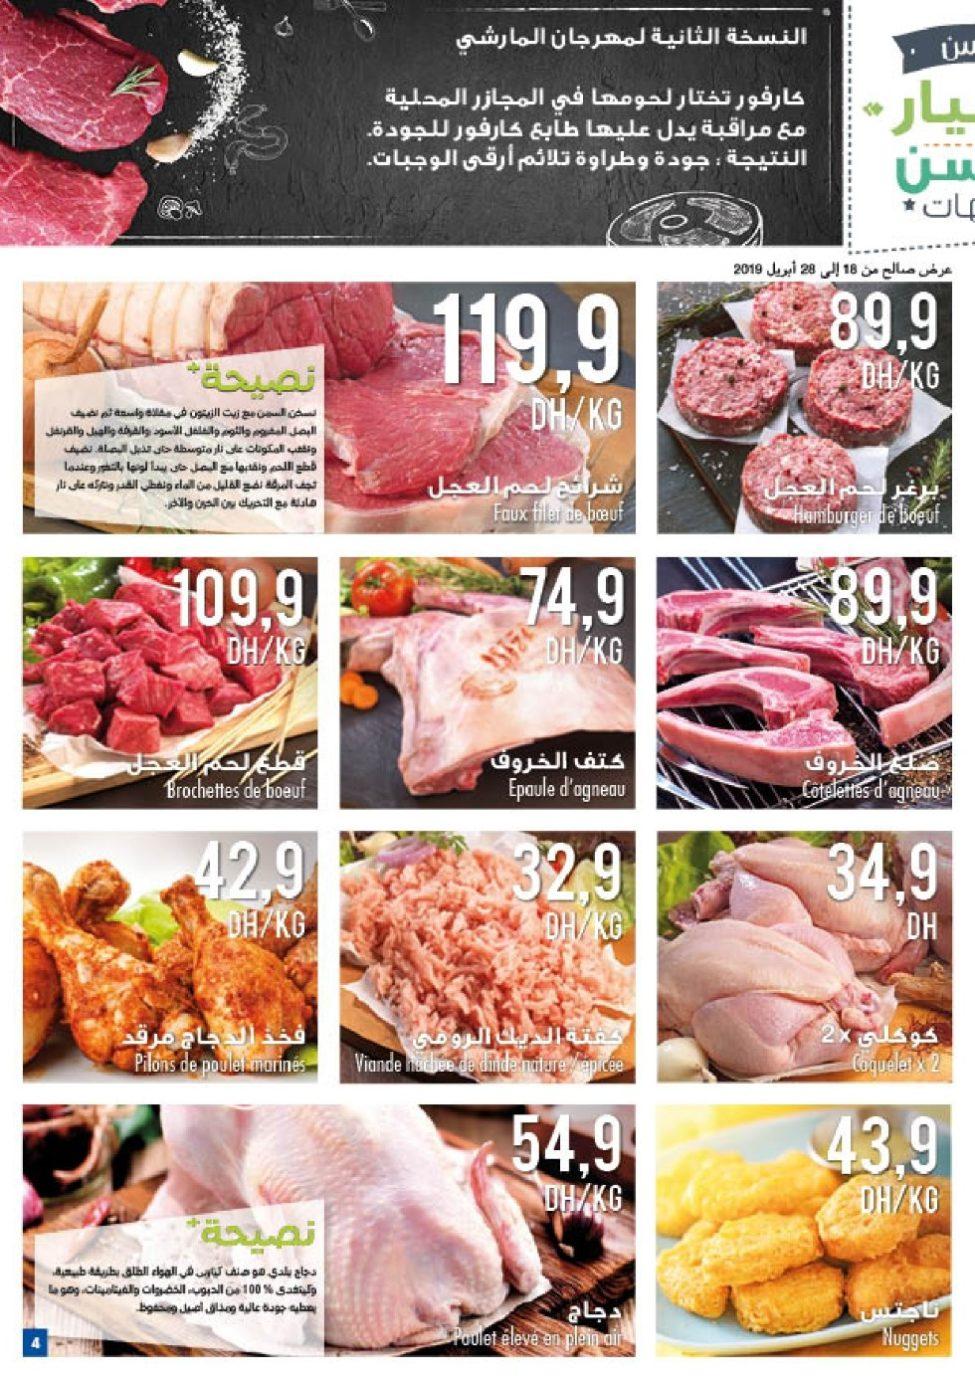 Catalogue Carrefour Maroc عواشر مباركة du 18 Avril au 1 Mai 2019